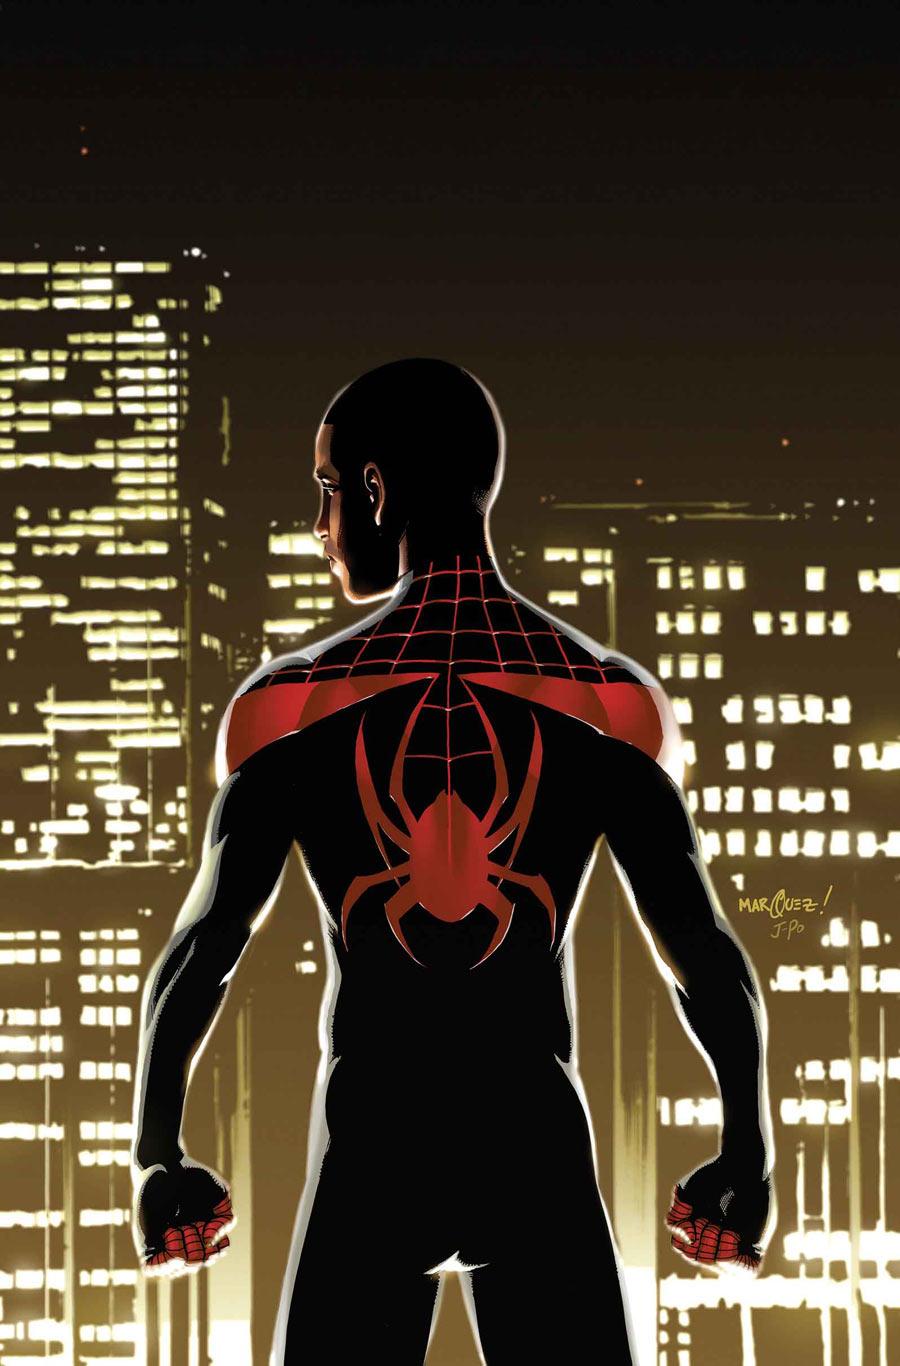 http://img2.wikia.nocookie.net/__cb20140219173532/marveldatabase/images/1/1a/Miles_Morales_Ultimate_Spider-Man_Vol_1_1_Textless.jpg